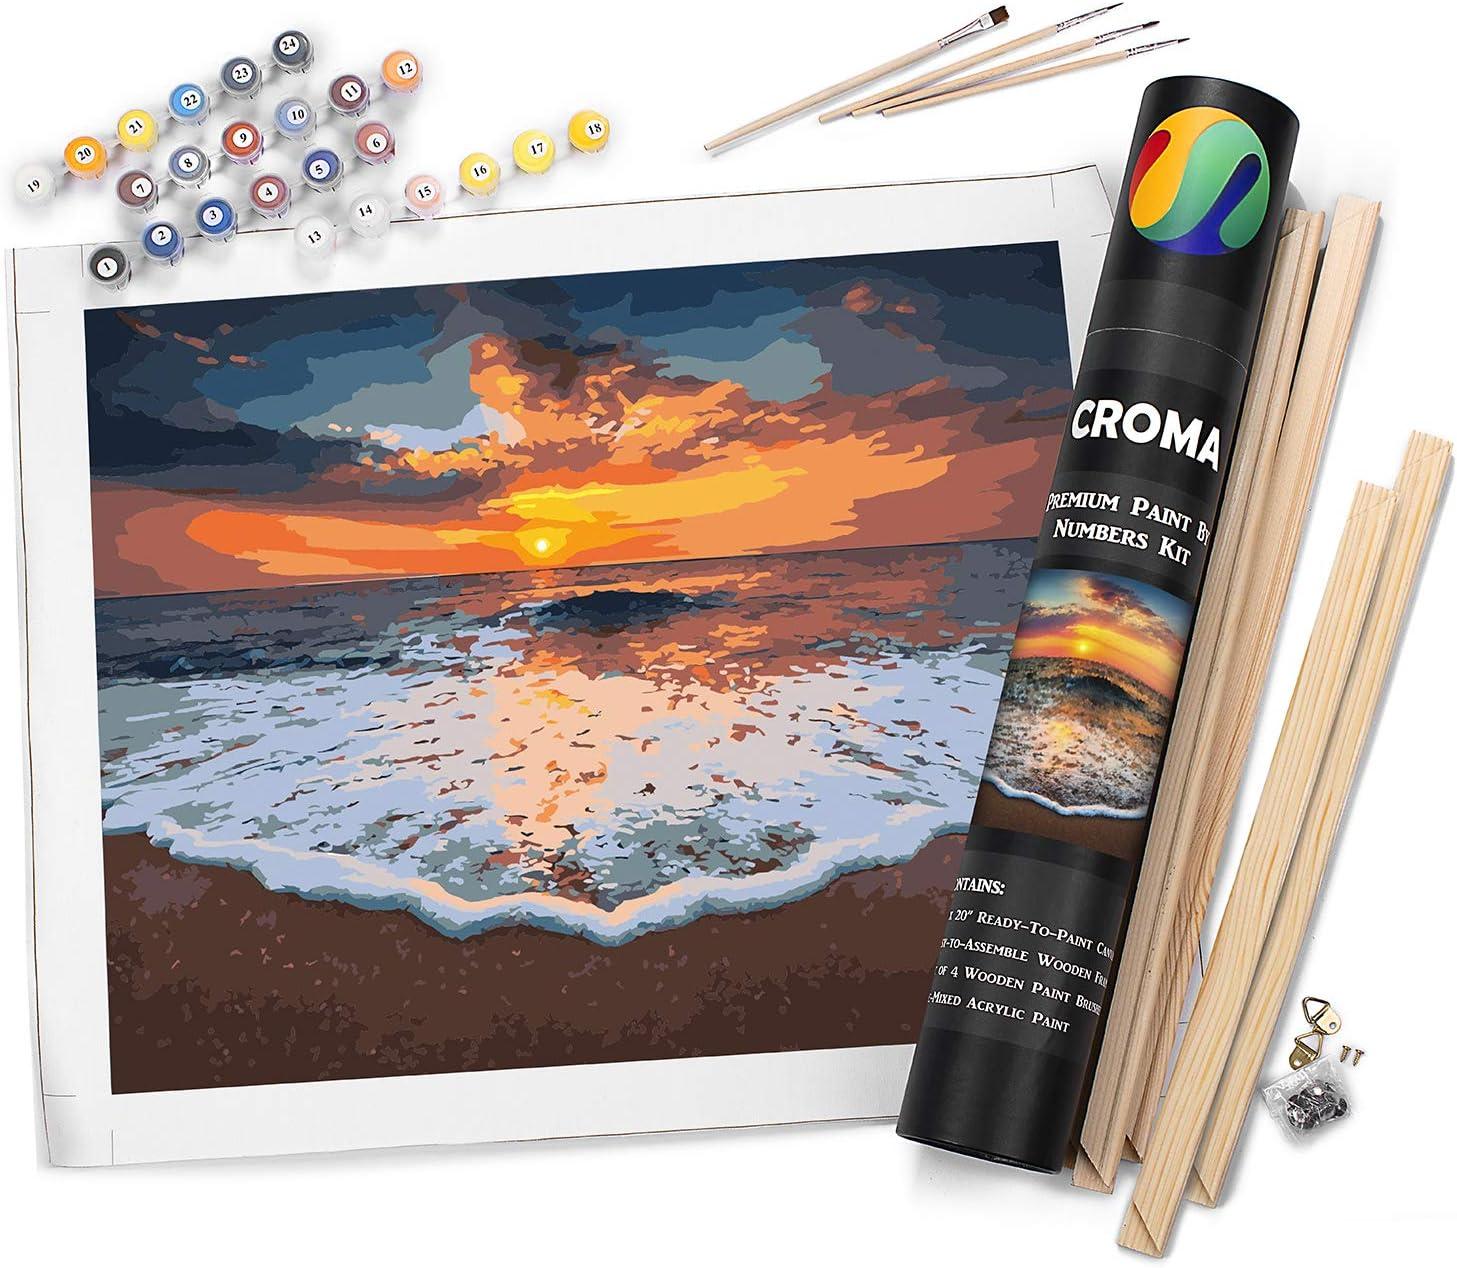 Wholesale Croma Premium Luxury goods Paint by Numbers Adult Advanced Sunset Beach Kit